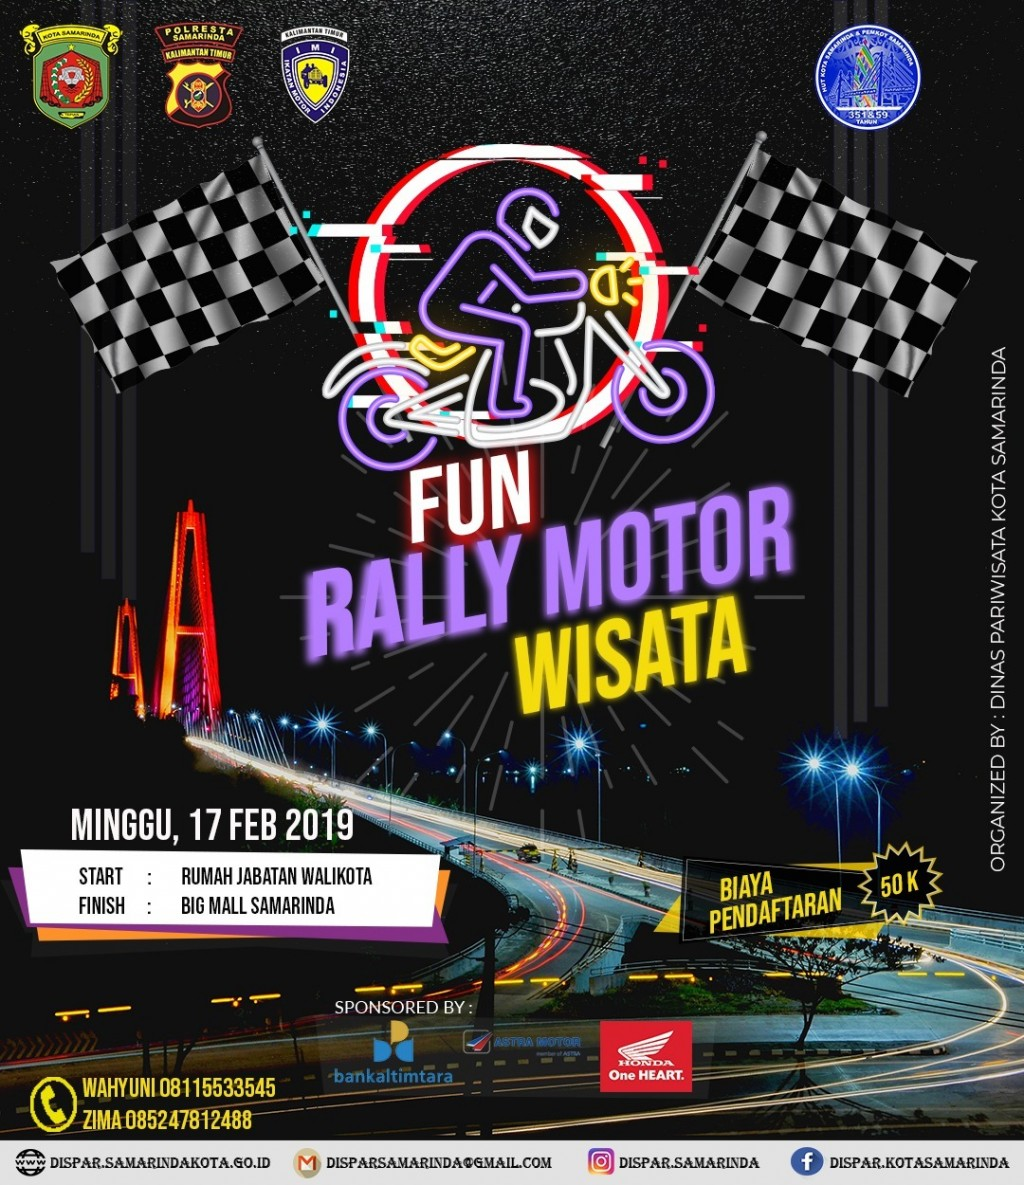 Fun Rally Motor Wisata Samarinda